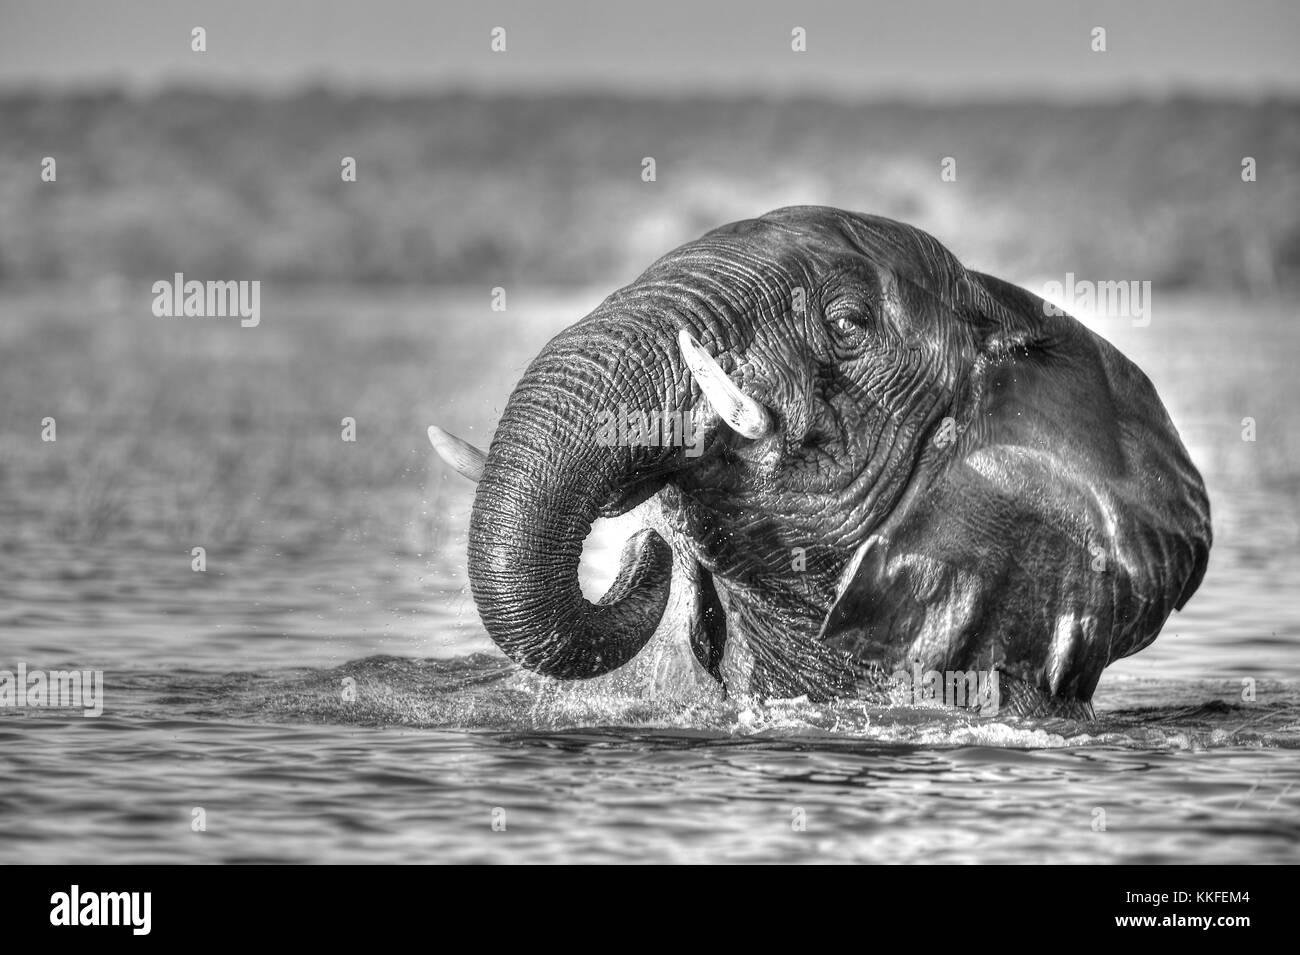 Tierwelt am Chobe River, Botswana Stockbild